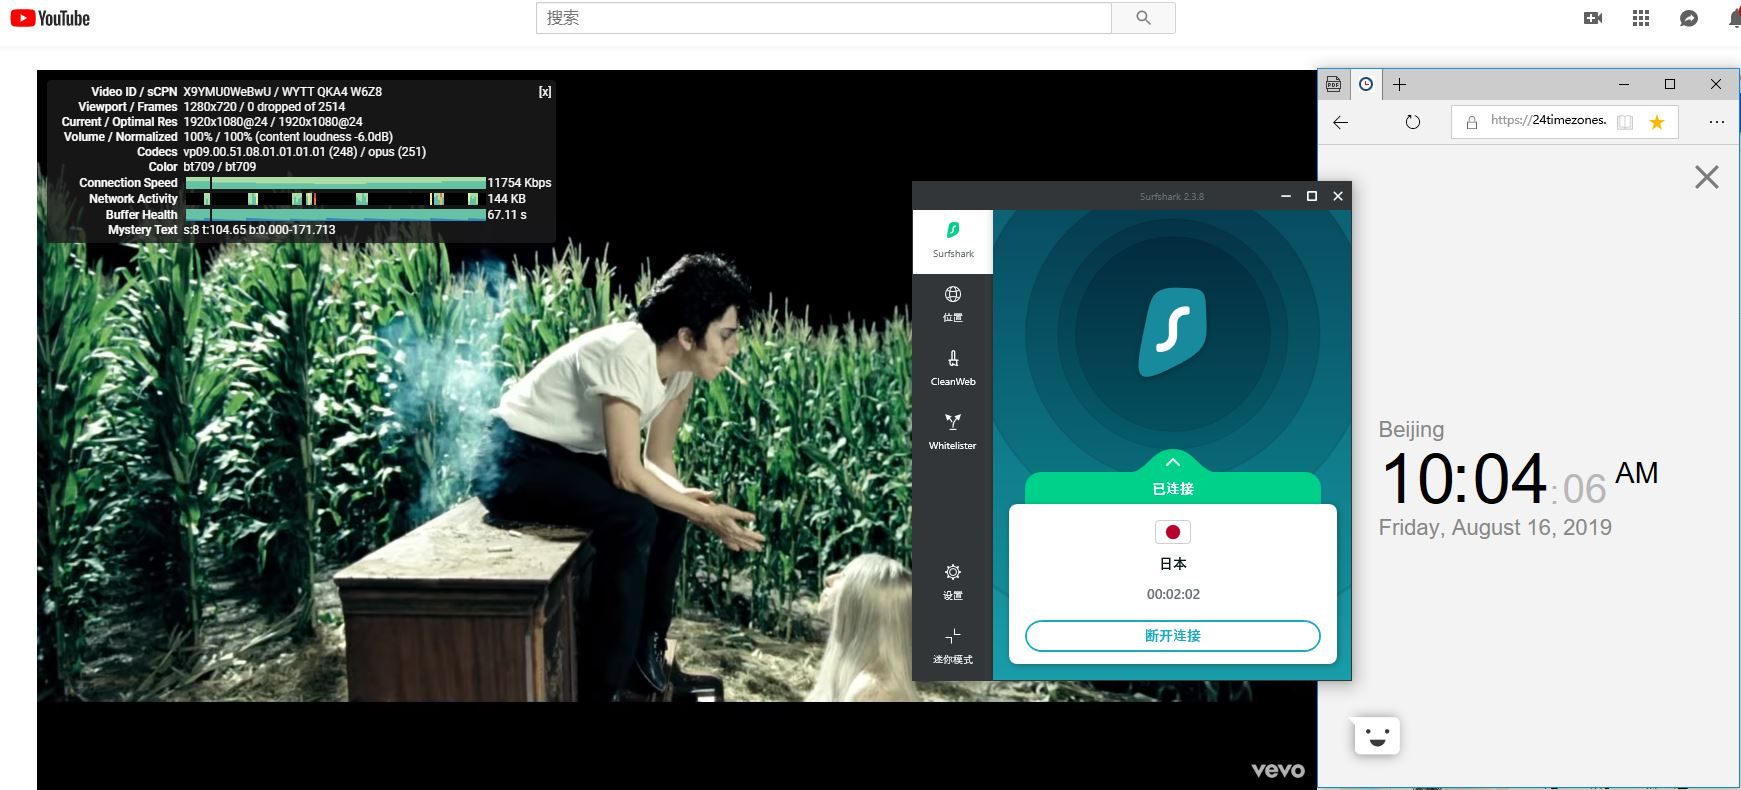 surfshark windows 日本服务器 中国翻墙 科学上网 -YouTube 速度测试-20190816